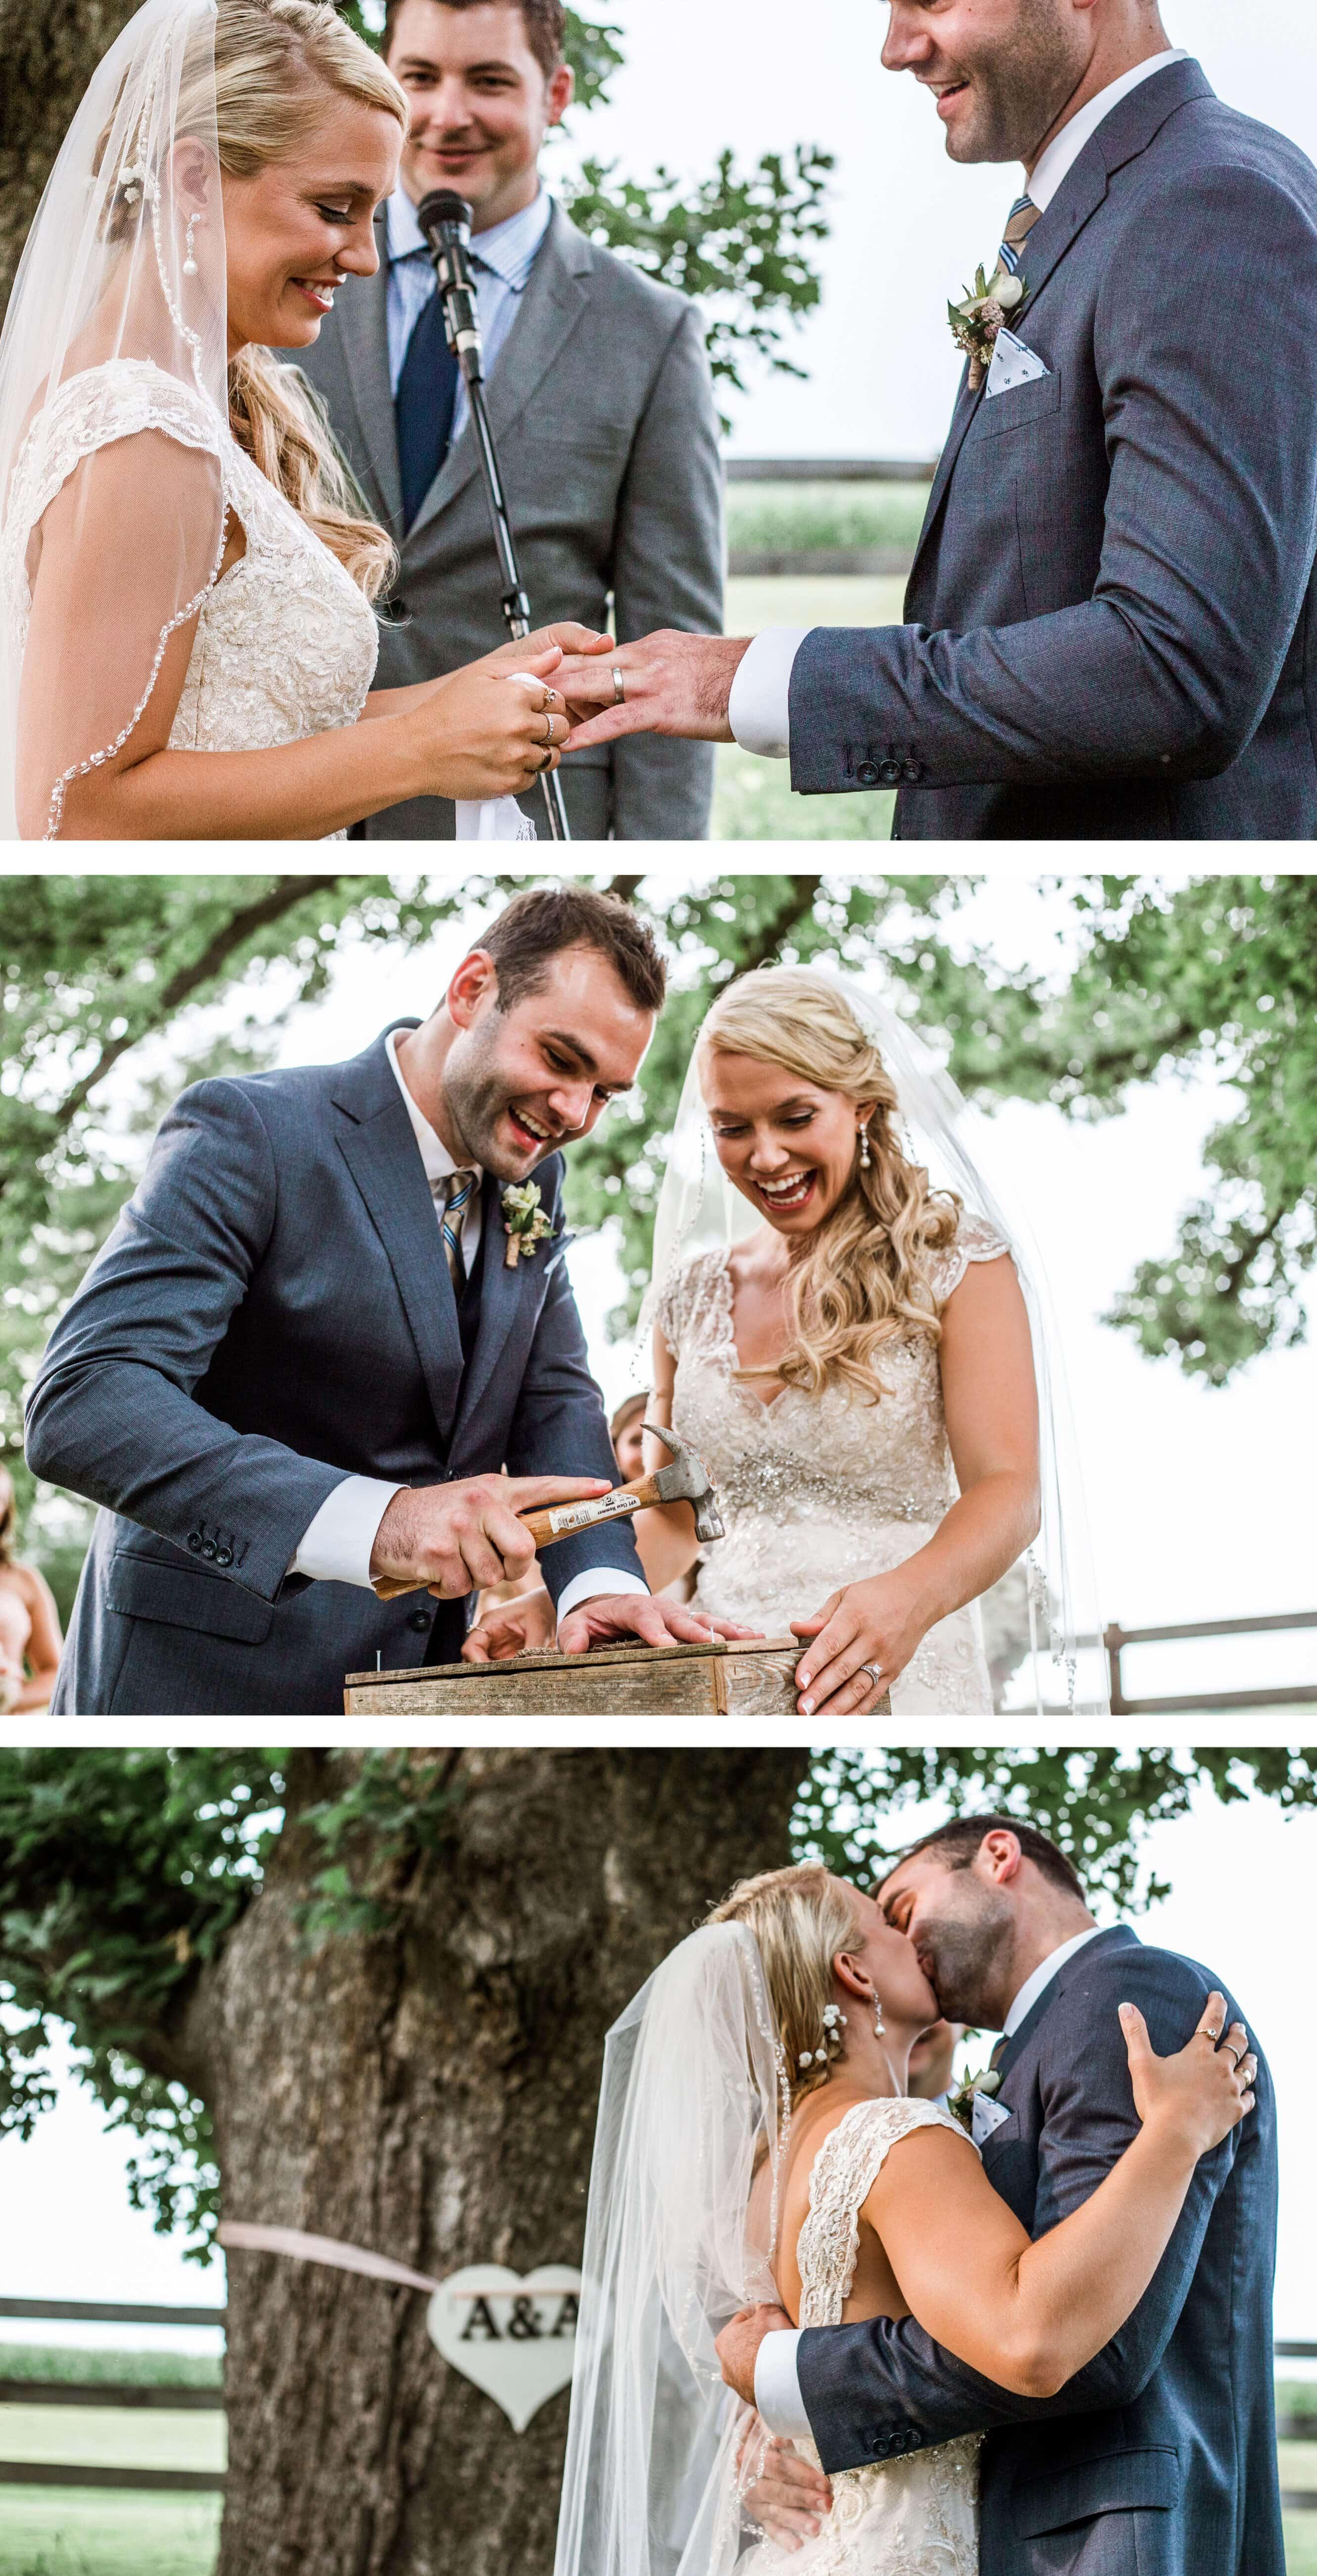 Sugarland Barn ceremony under oak tree - Sussex Wedding Photographer